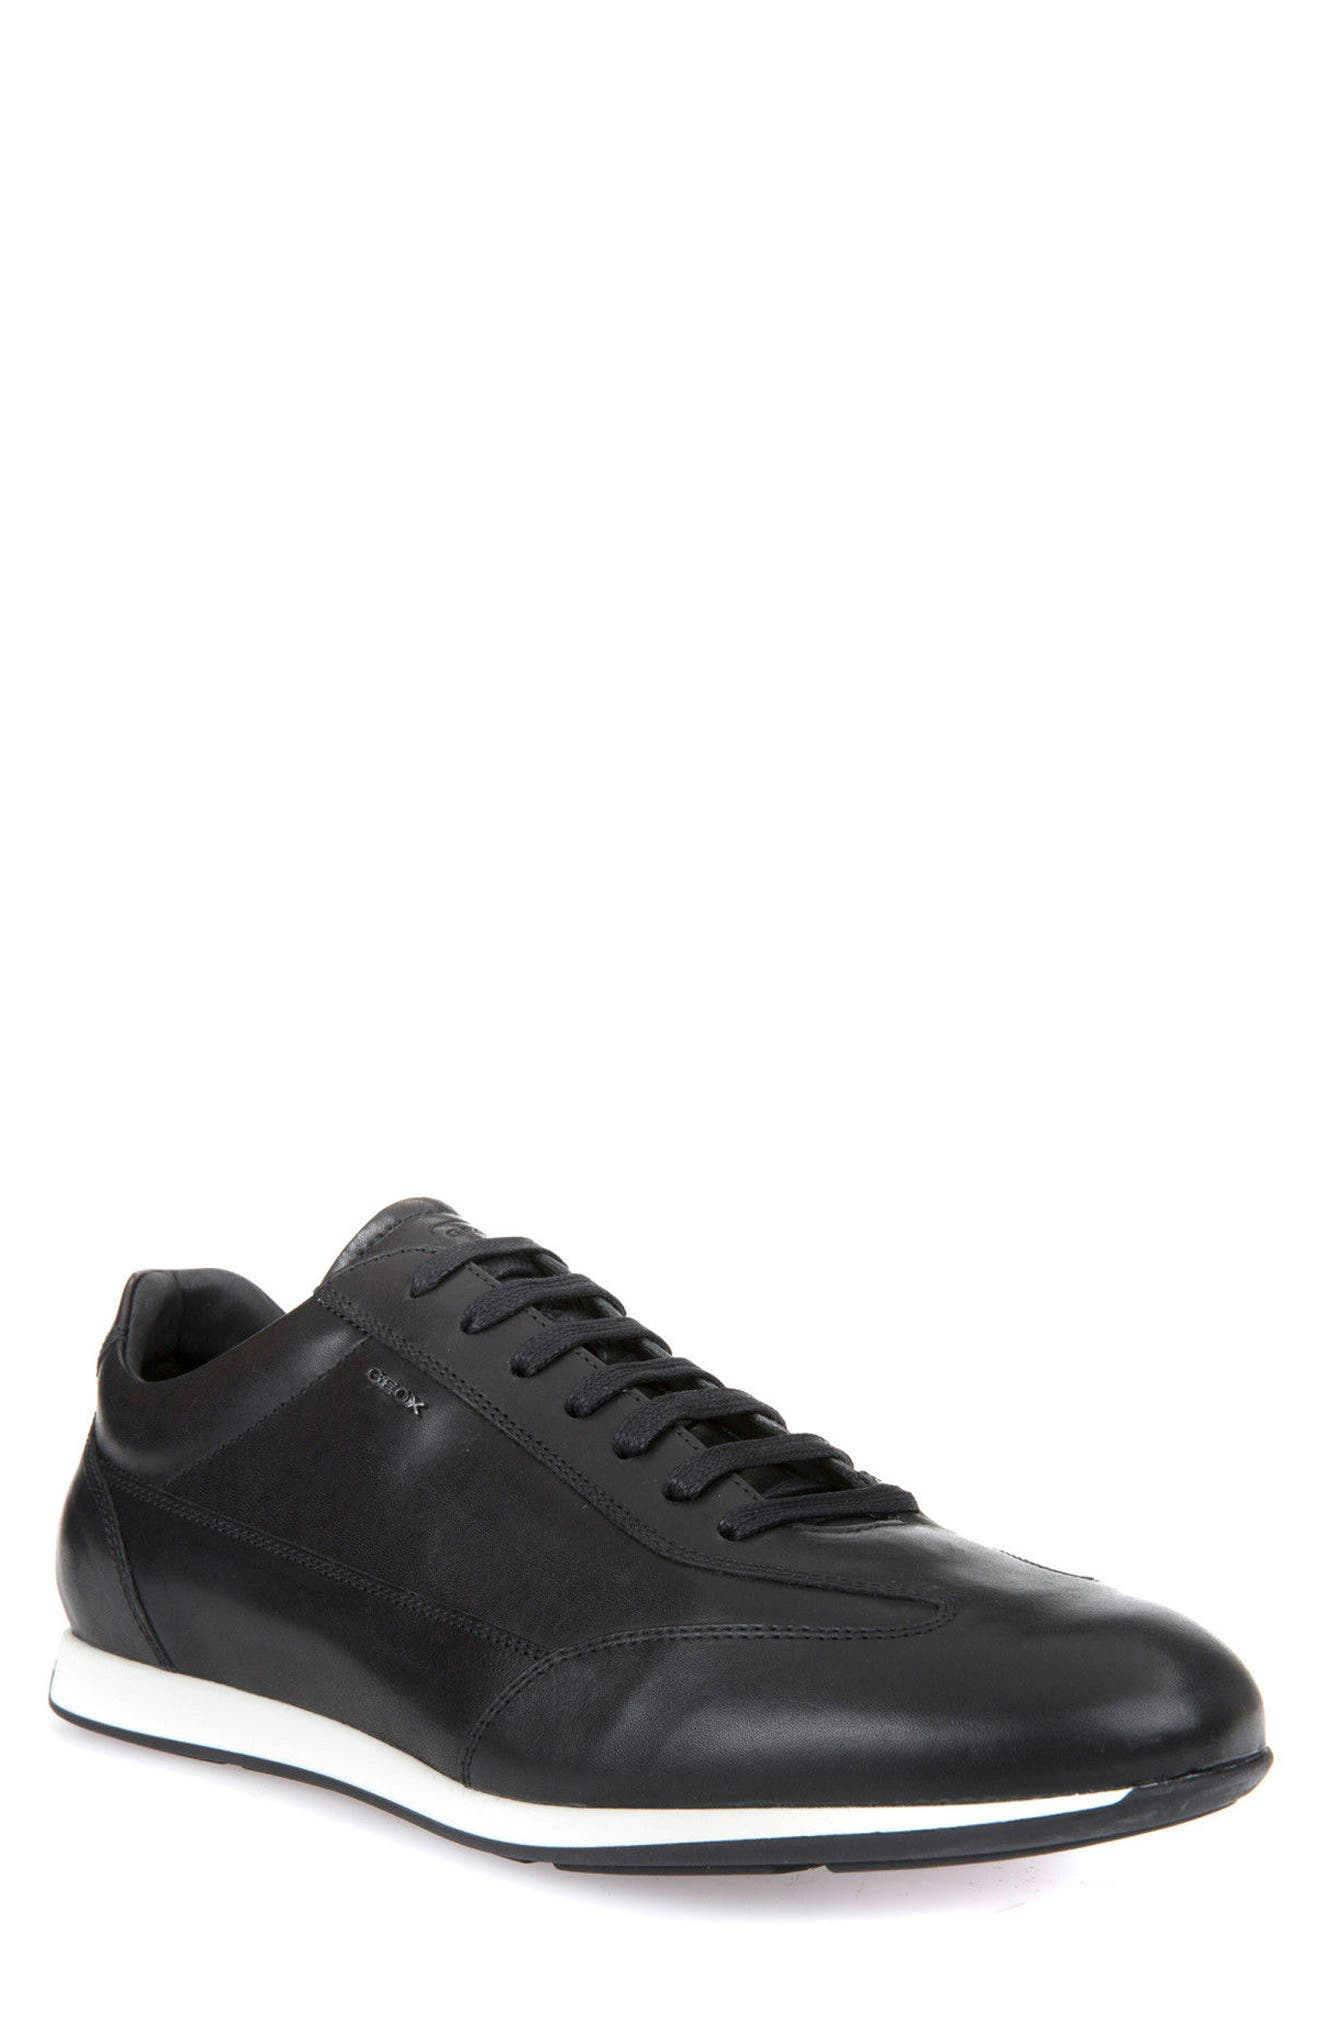 Alternate Image 1 Selected - Geox Clemet 1 Sneaker (Men)